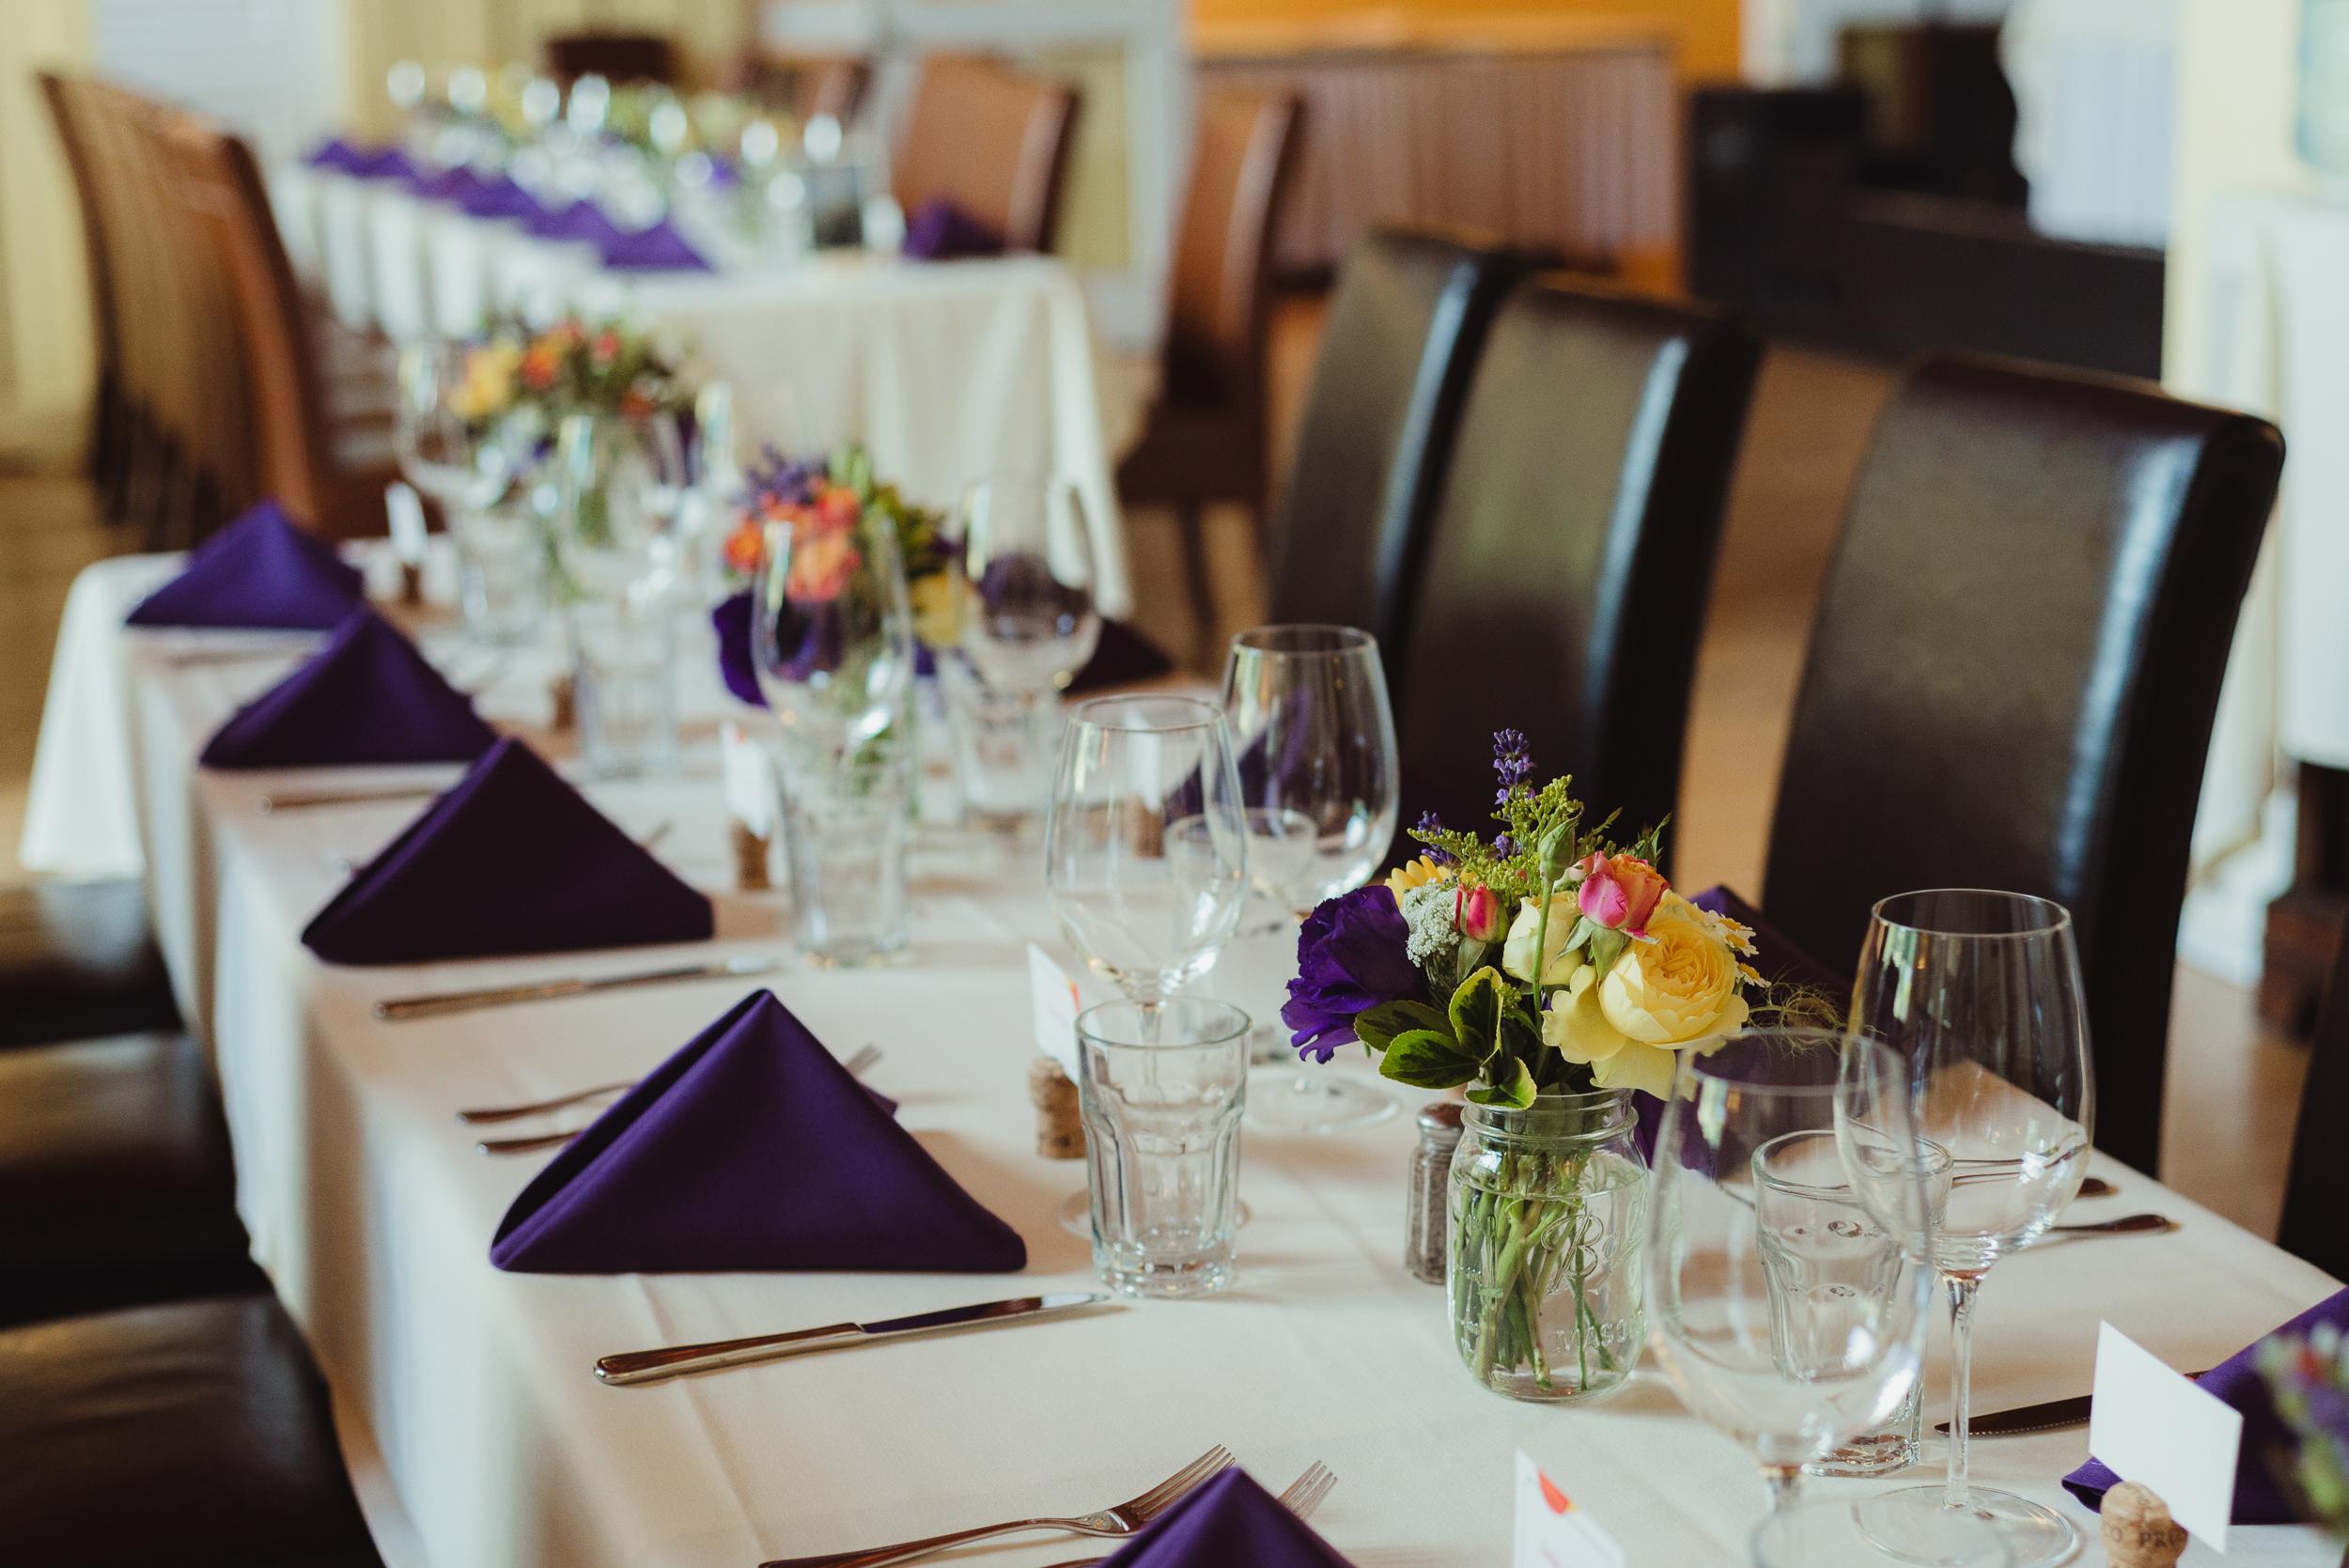 062-highland-dell-lodge-russian-river-wedding-vivianchen-040.jpg